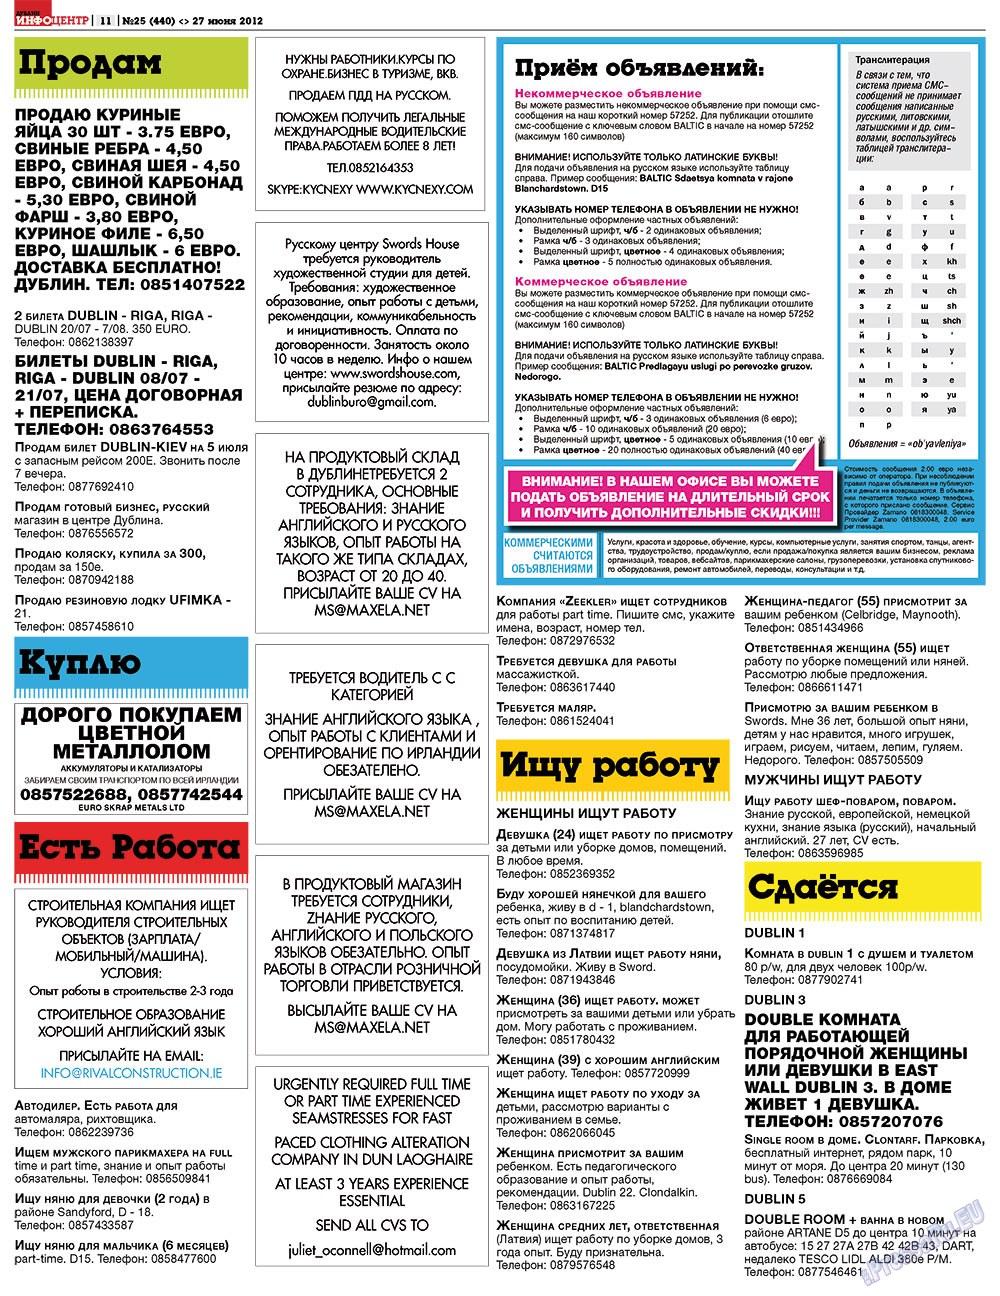 Дублин инфоцентр (газета). 2012 год, номер 25, стр. 11